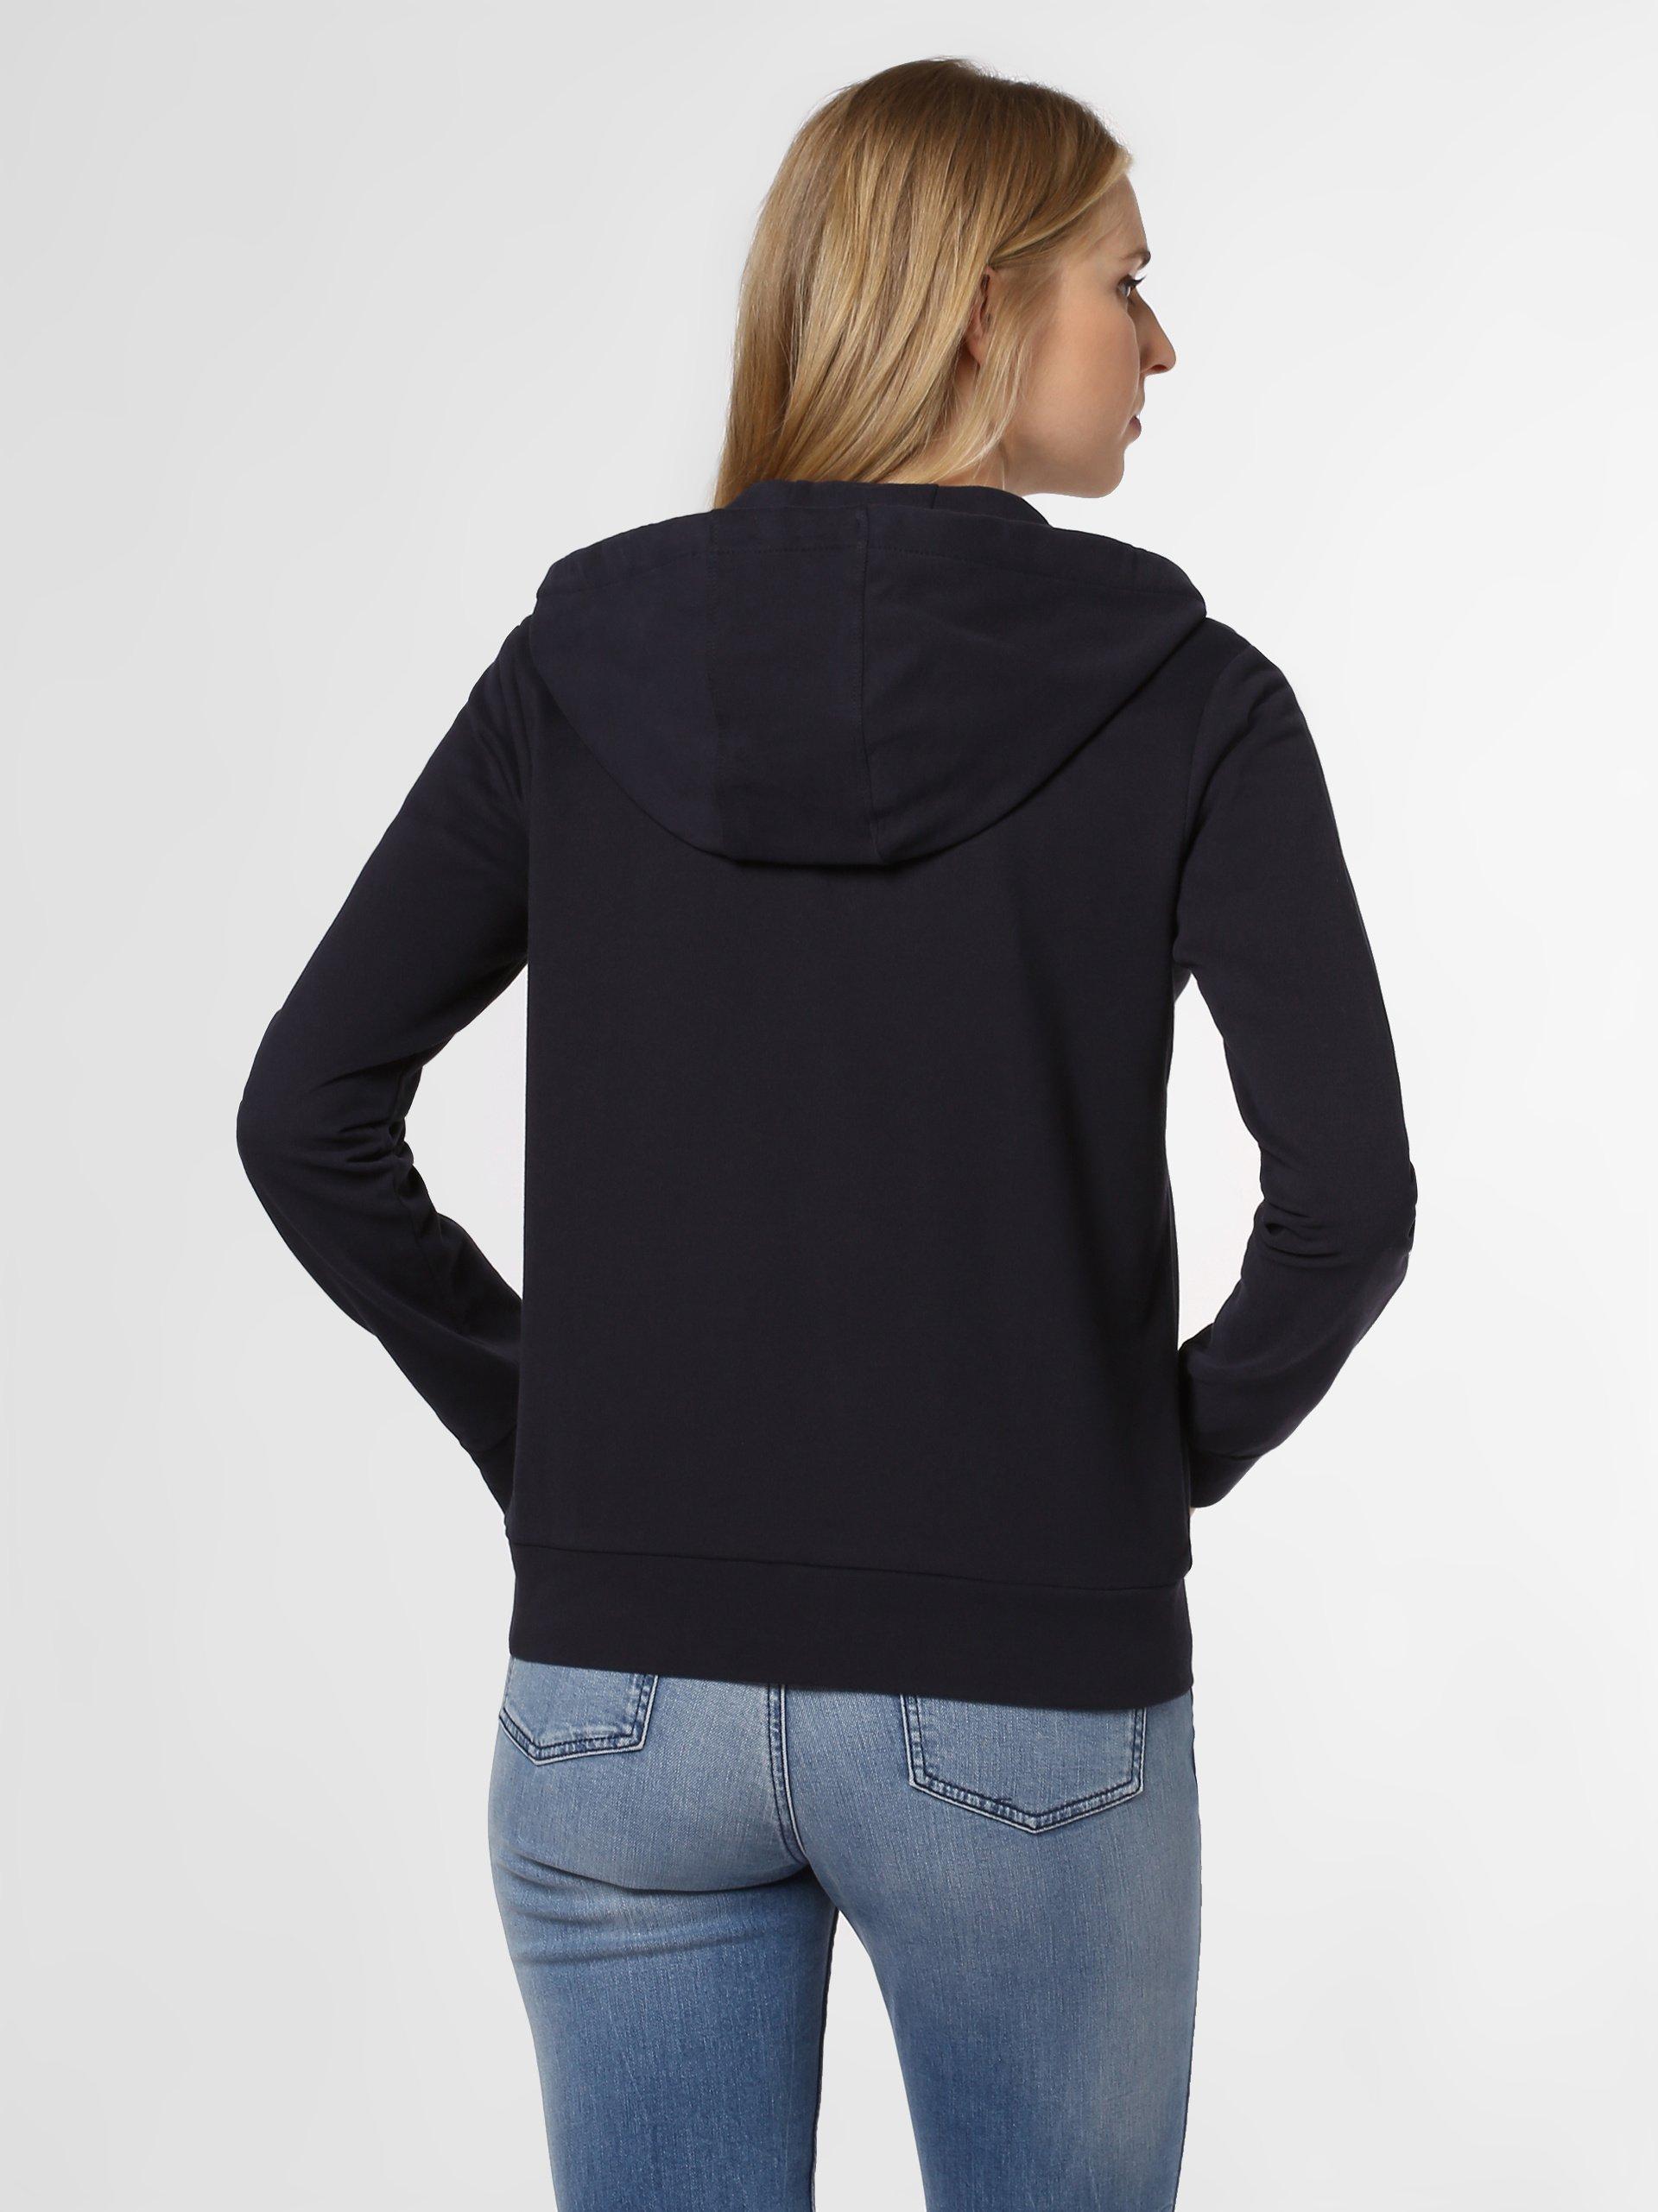 Marie Lund Damska bluza rozpinana